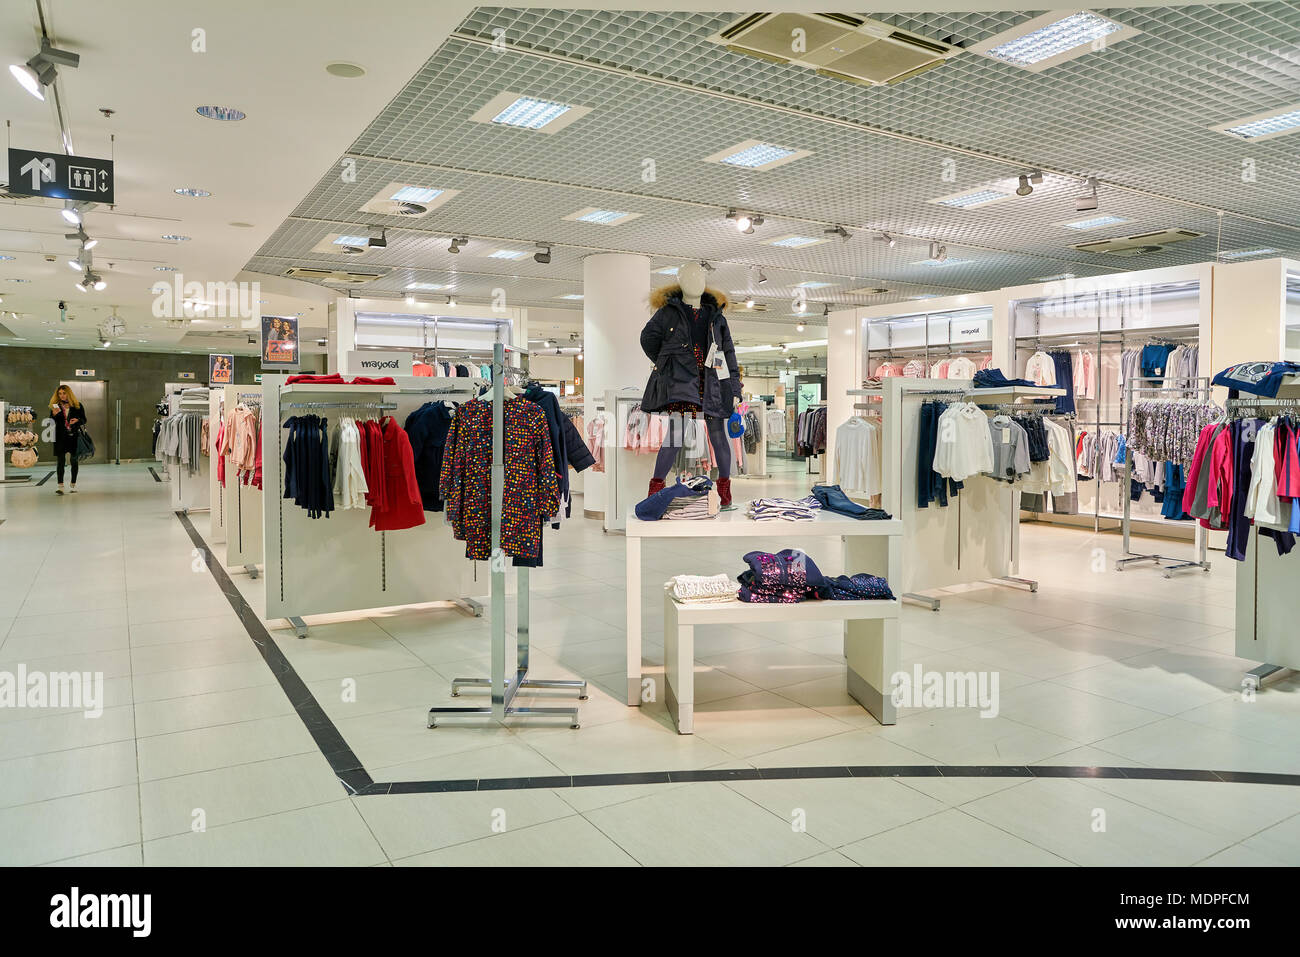 SAINT PETERSBURG, RUSSIA - CIRCA OCTOBER, 2017: inside 'Stockmann Nevsky Center' shopping center in Saint Petersburg. - Stock Image